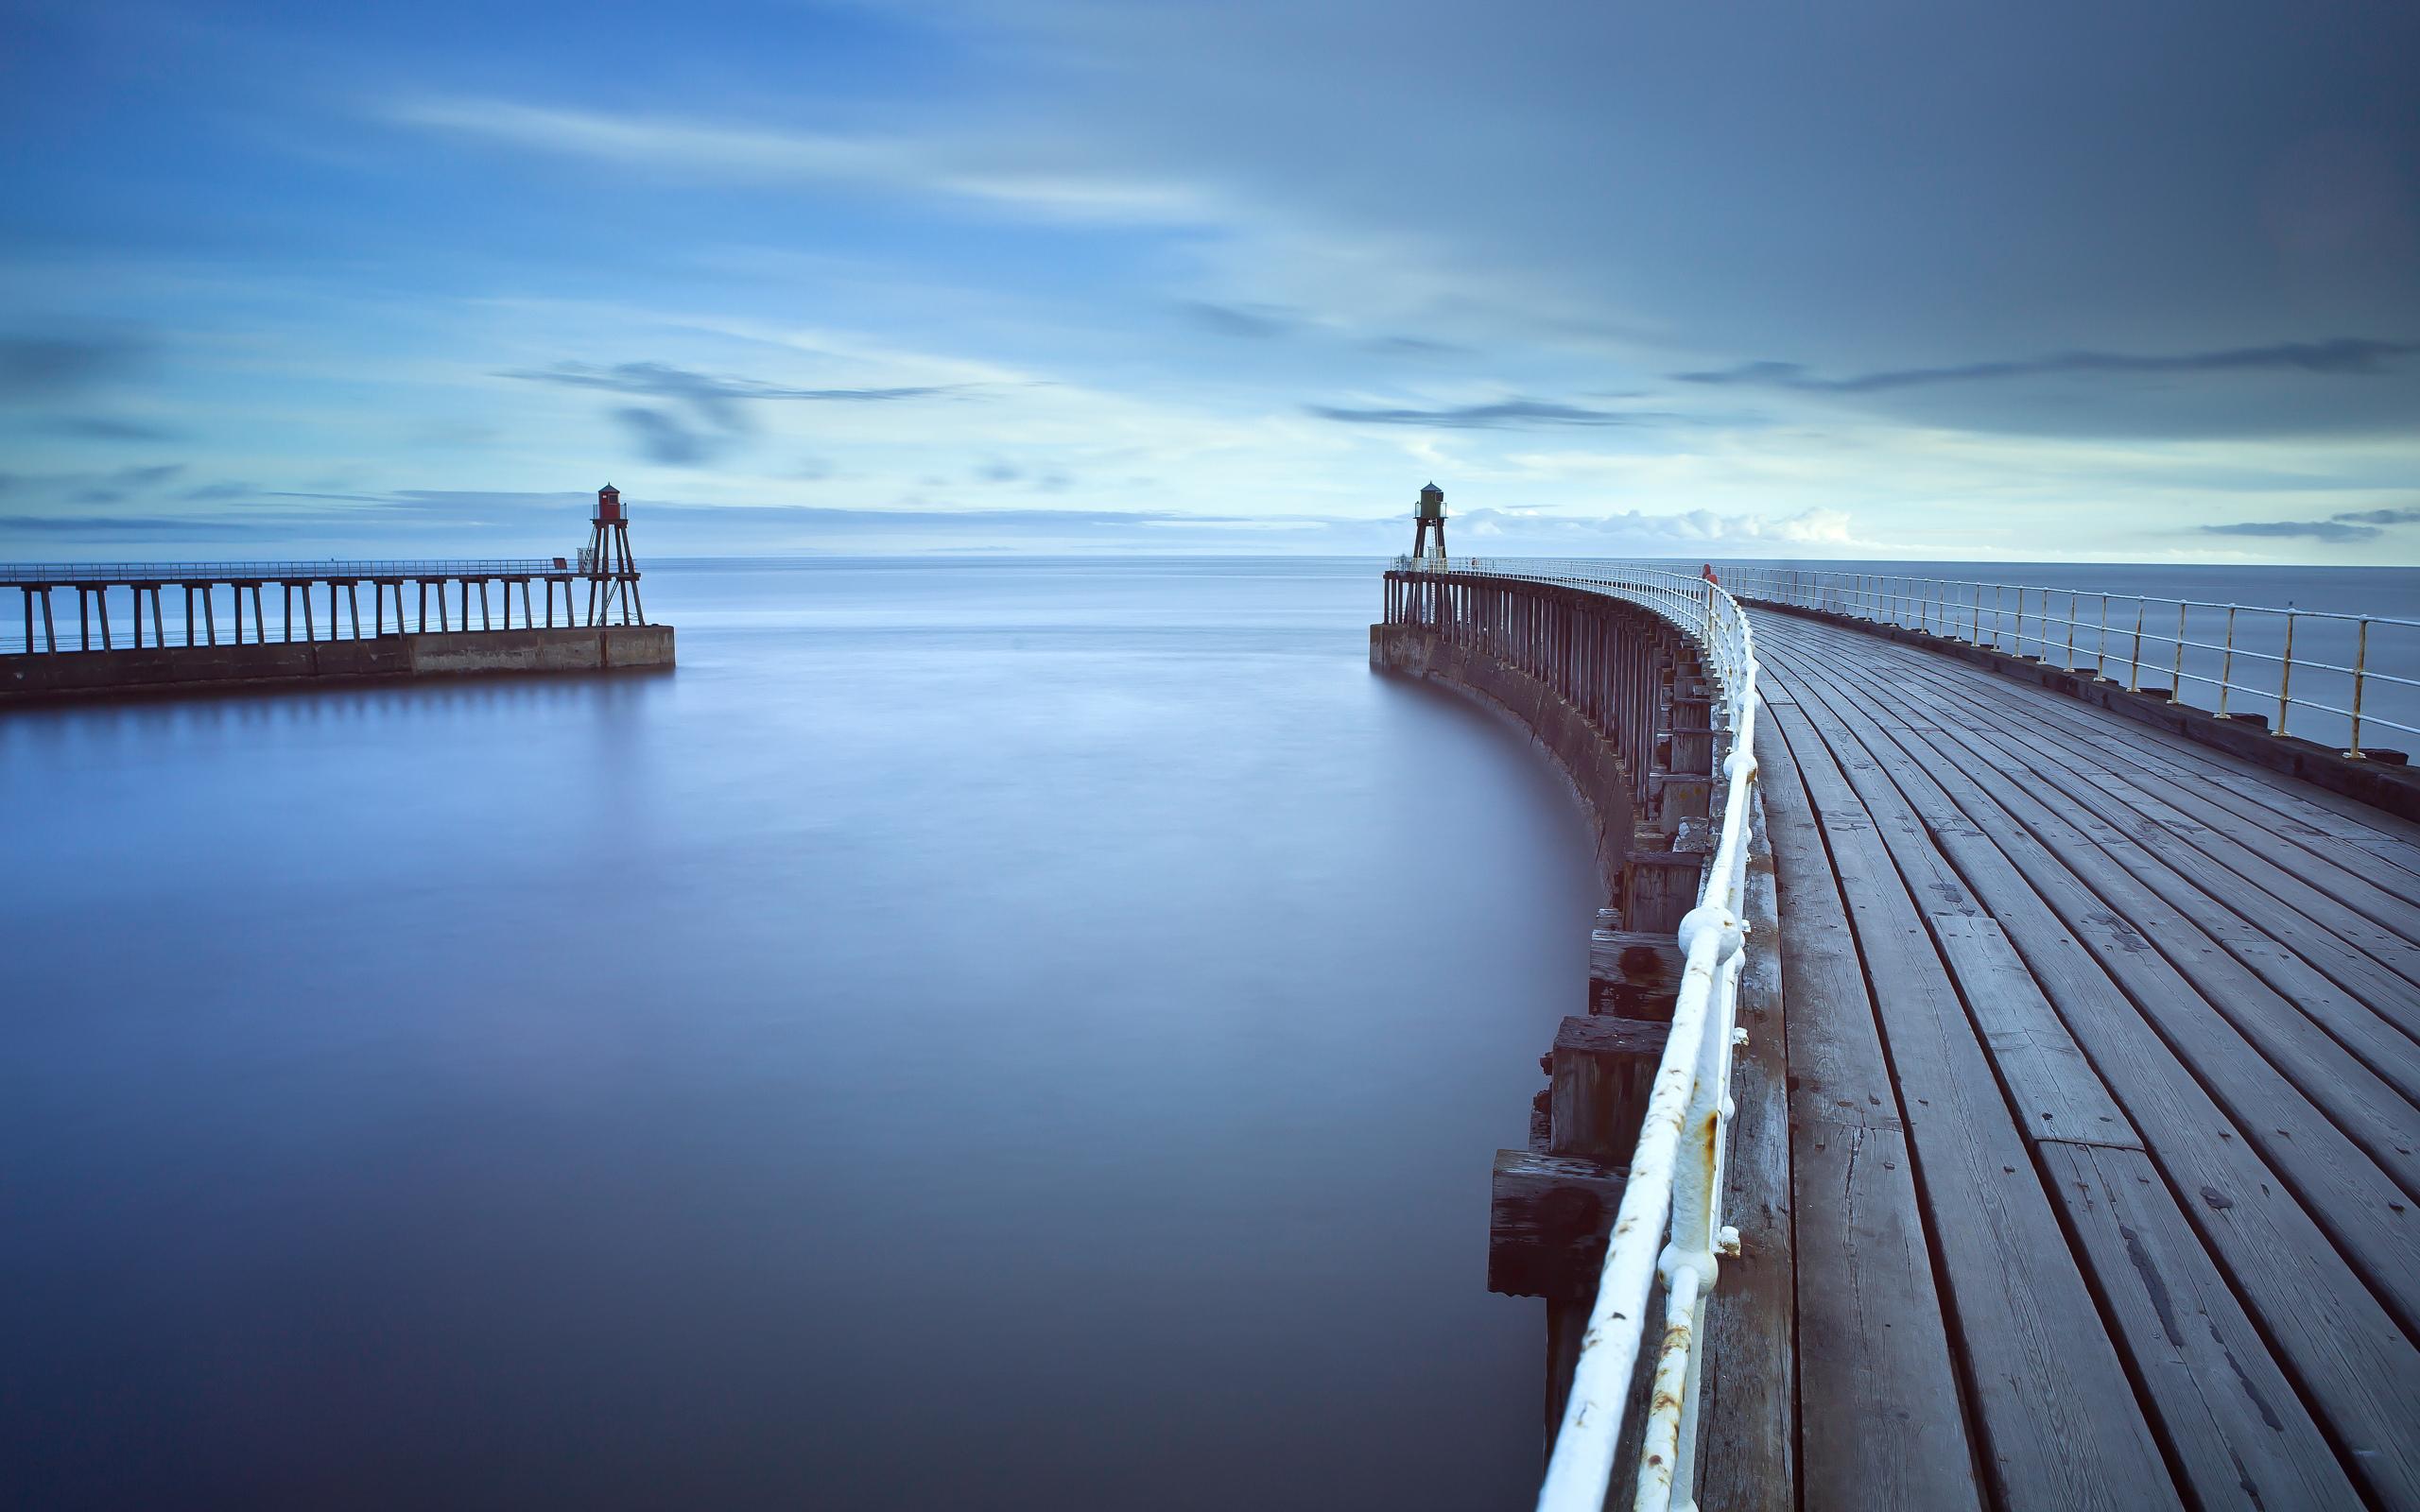 Lighthouse 3d Live Wallpaper Sea Hd Landscape Hd Desktop Wallpapers 4k Hd